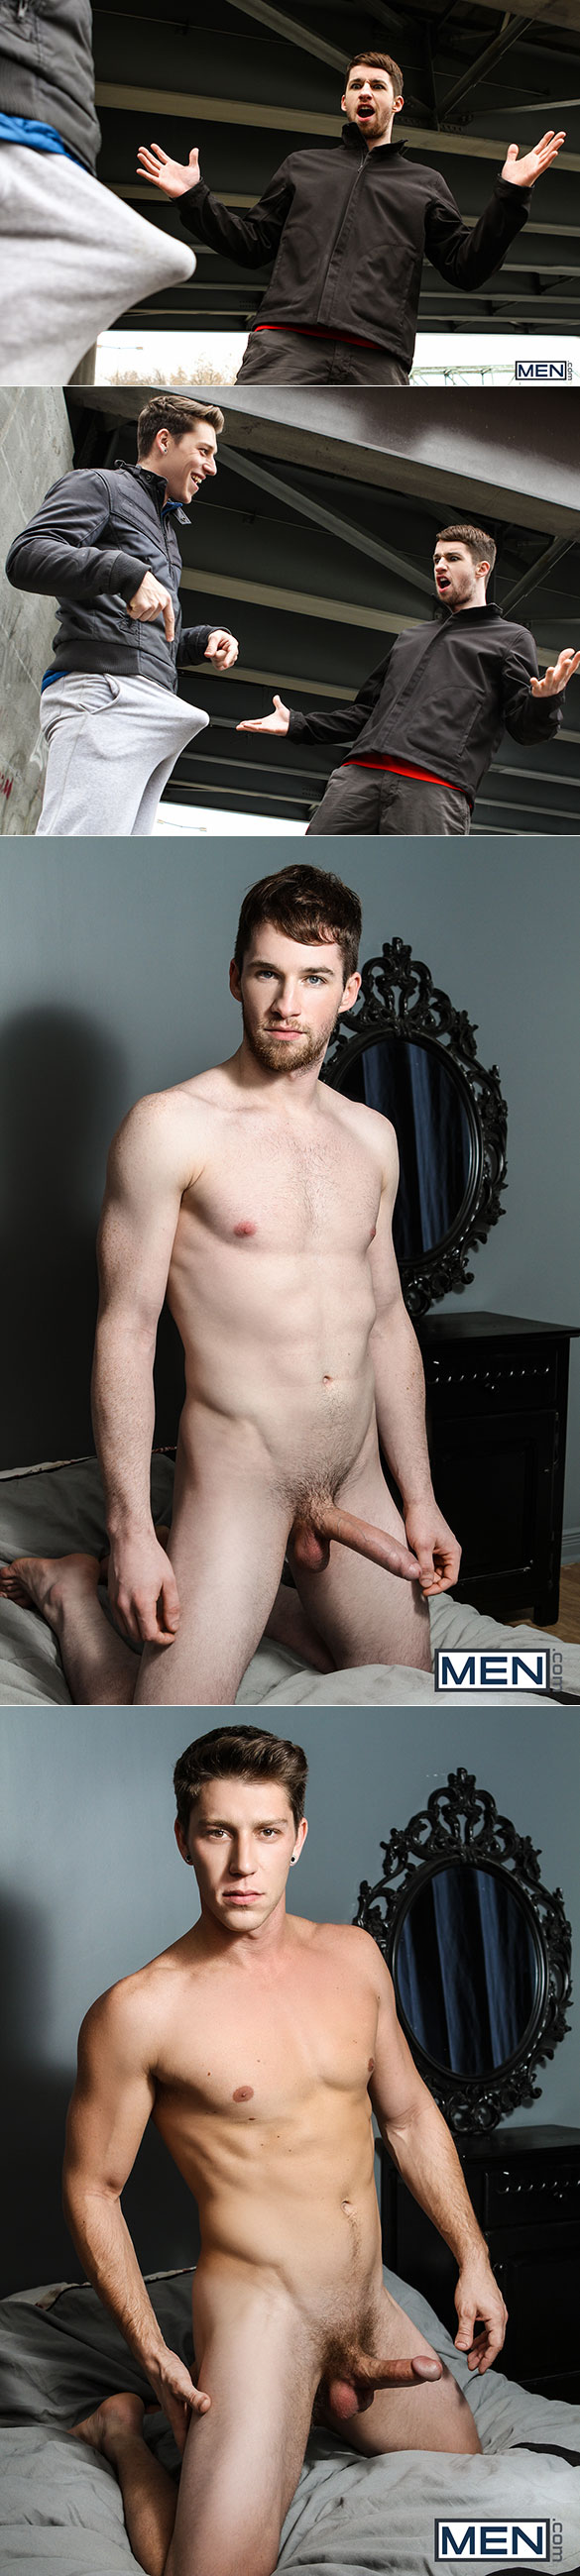 "Men.com: Paul Canon bangs Thyle Knoxx in ""Pranksters, Part 2"""